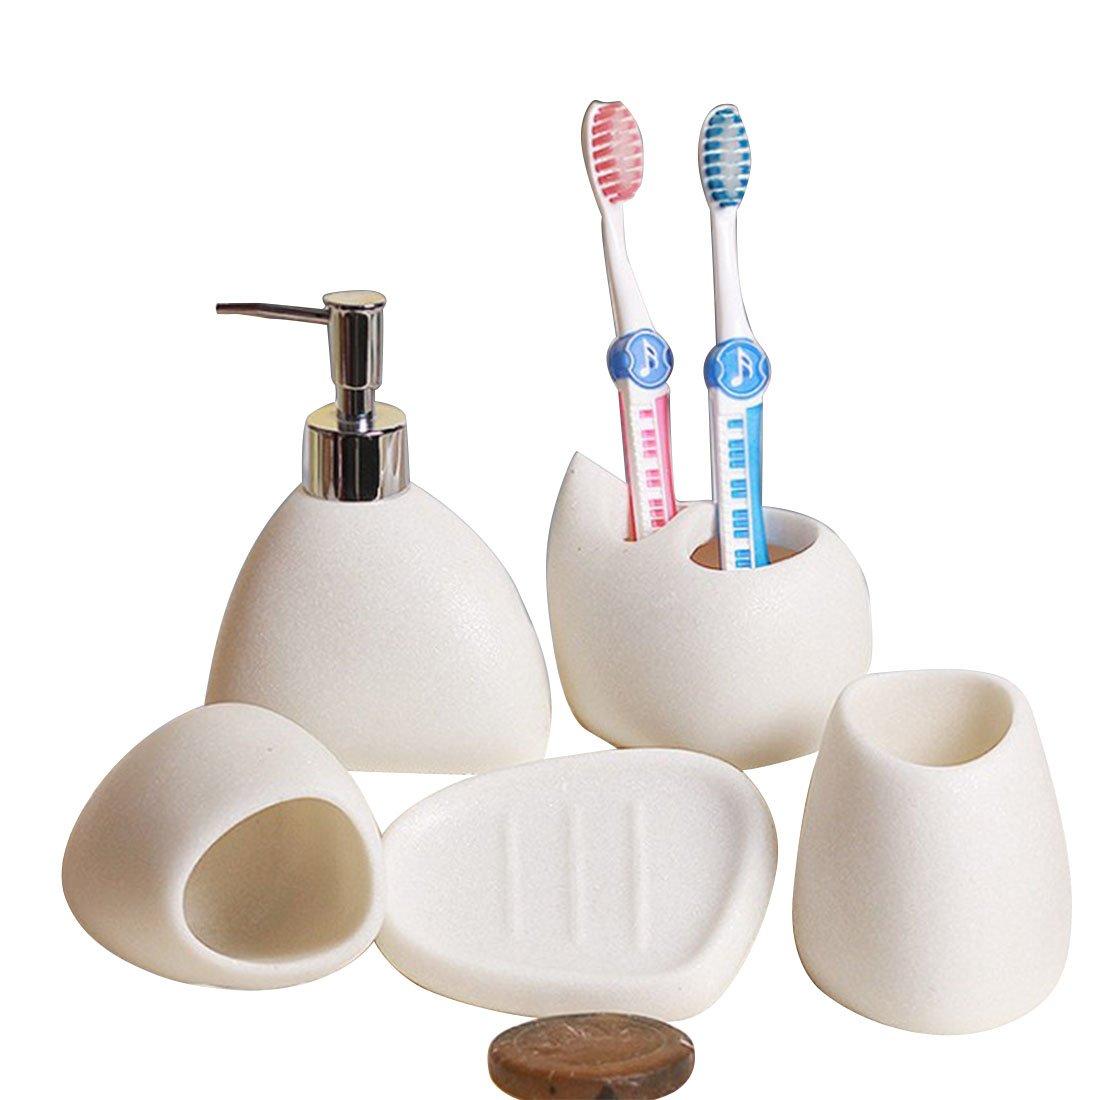 Ceramic White Sand Bathroom Set Of 5 Home Wash Set Bathroom Simple Set (Color : White)